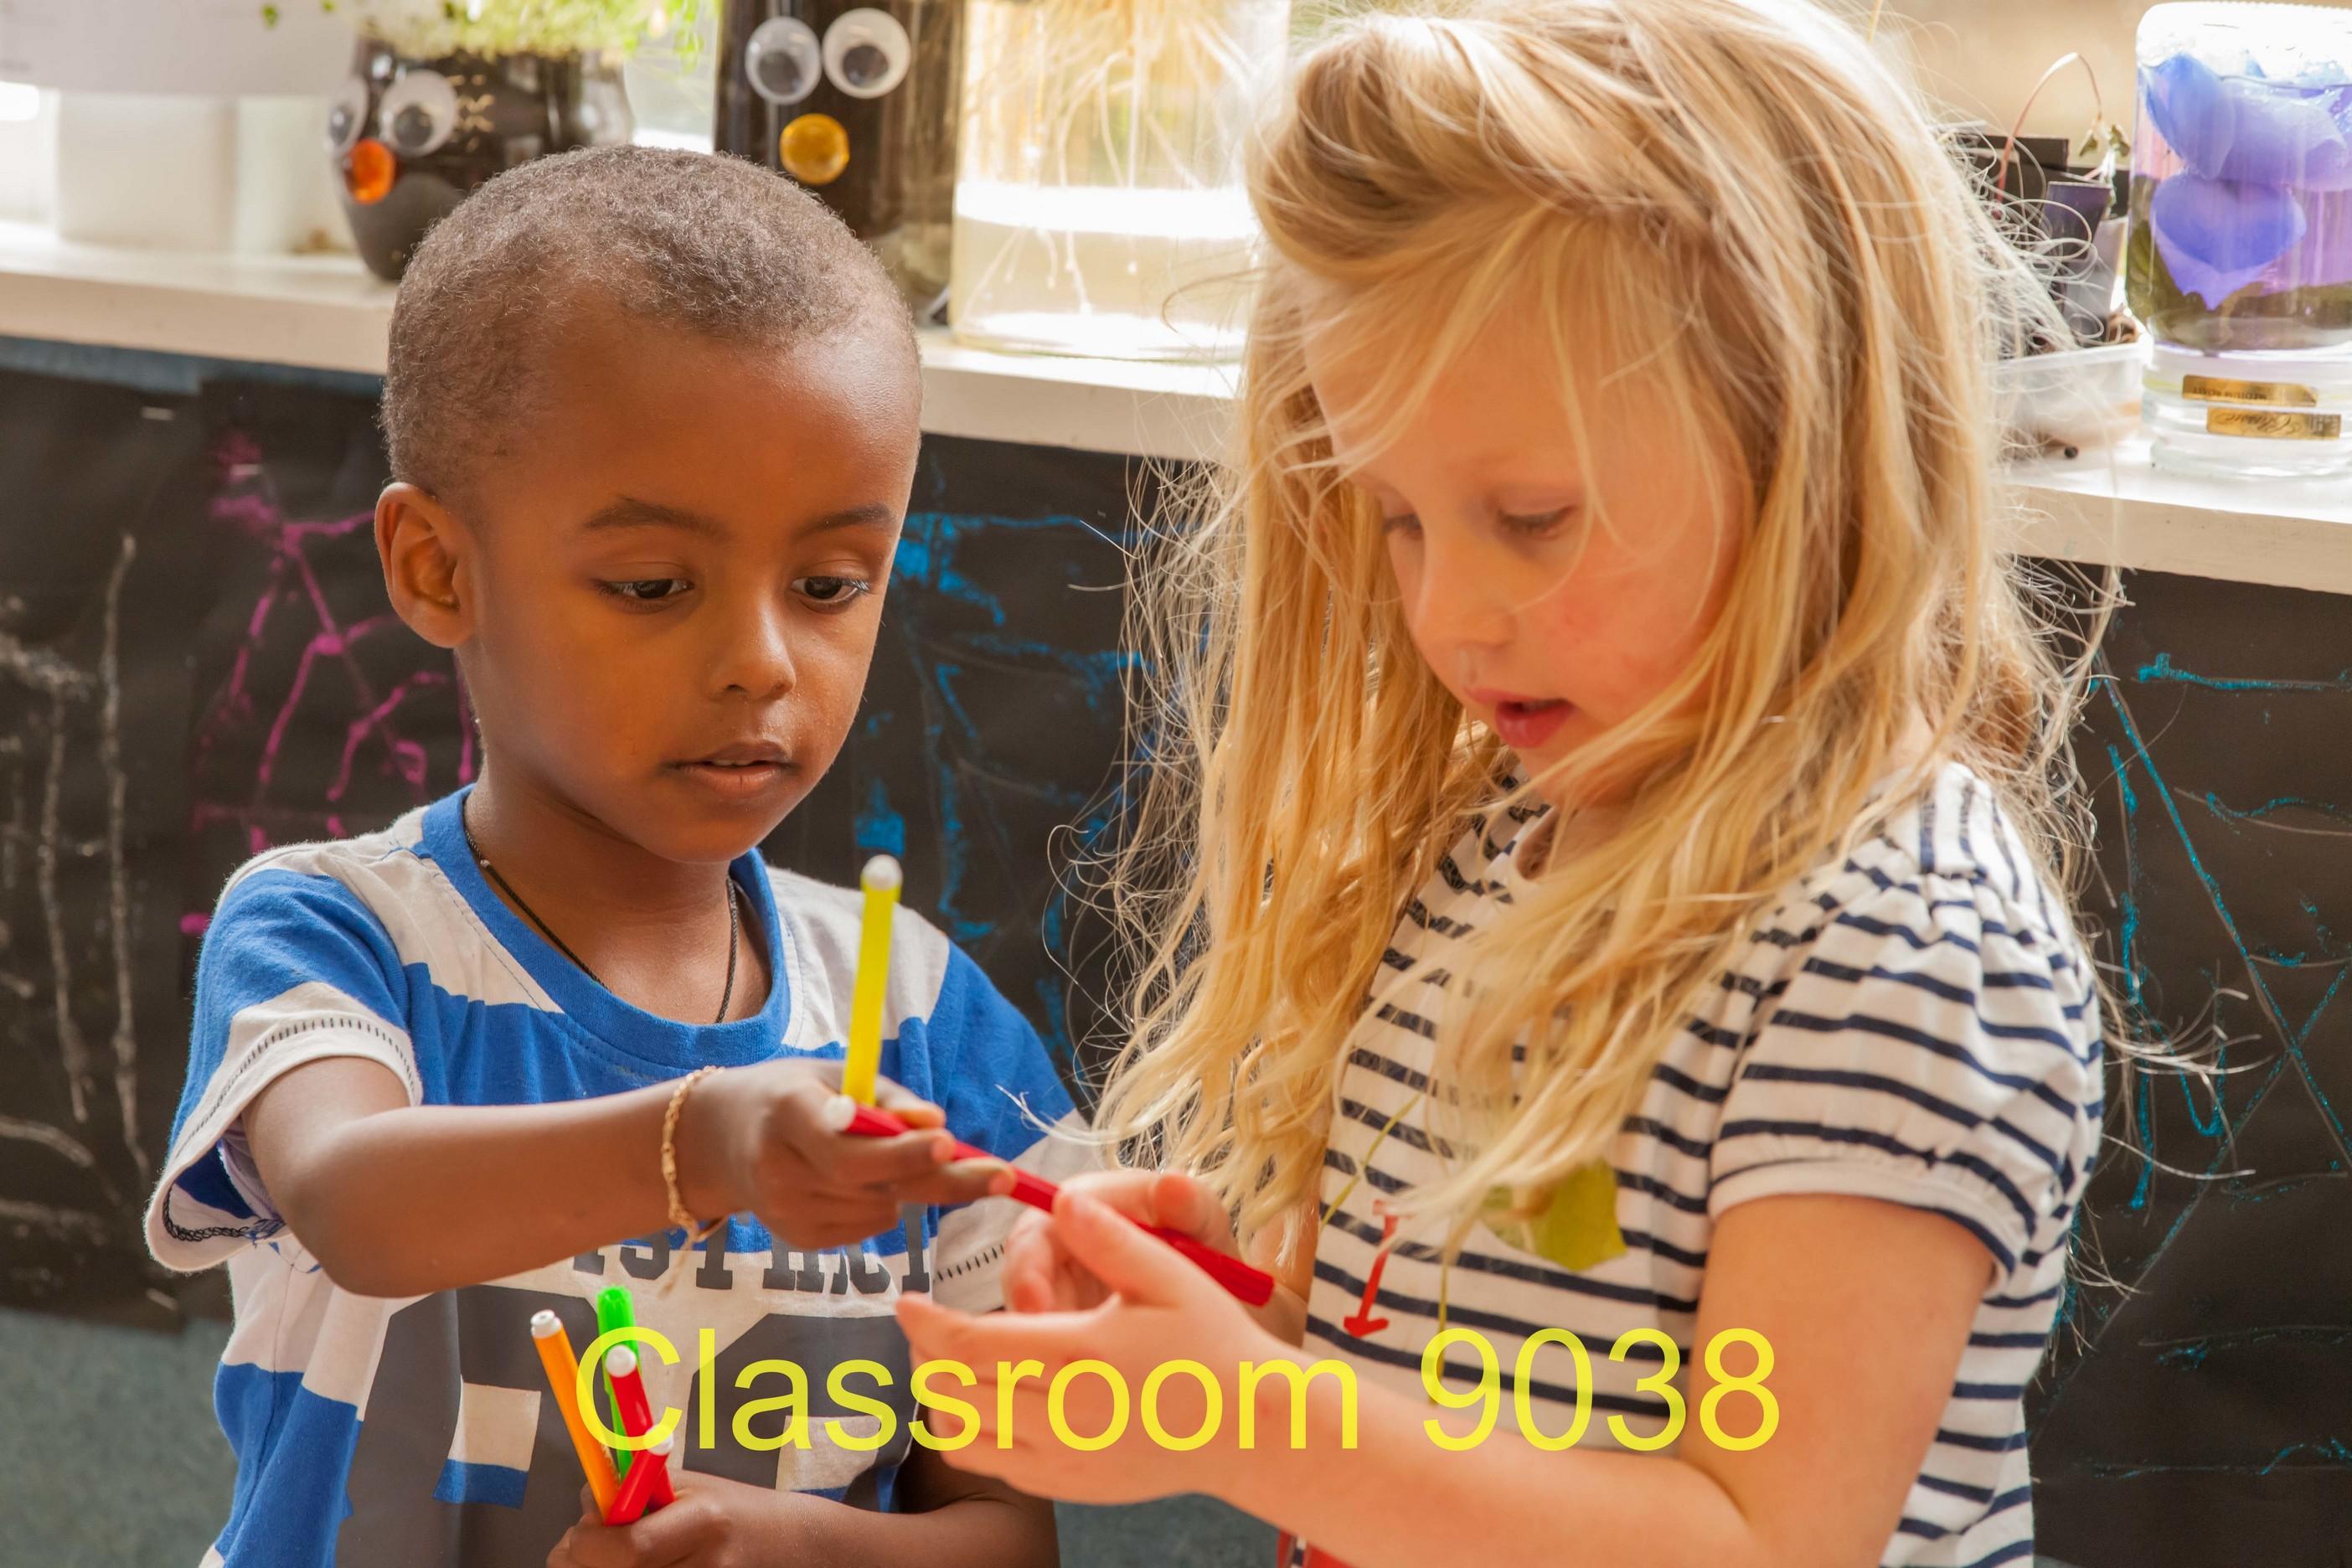 Classroom 9038